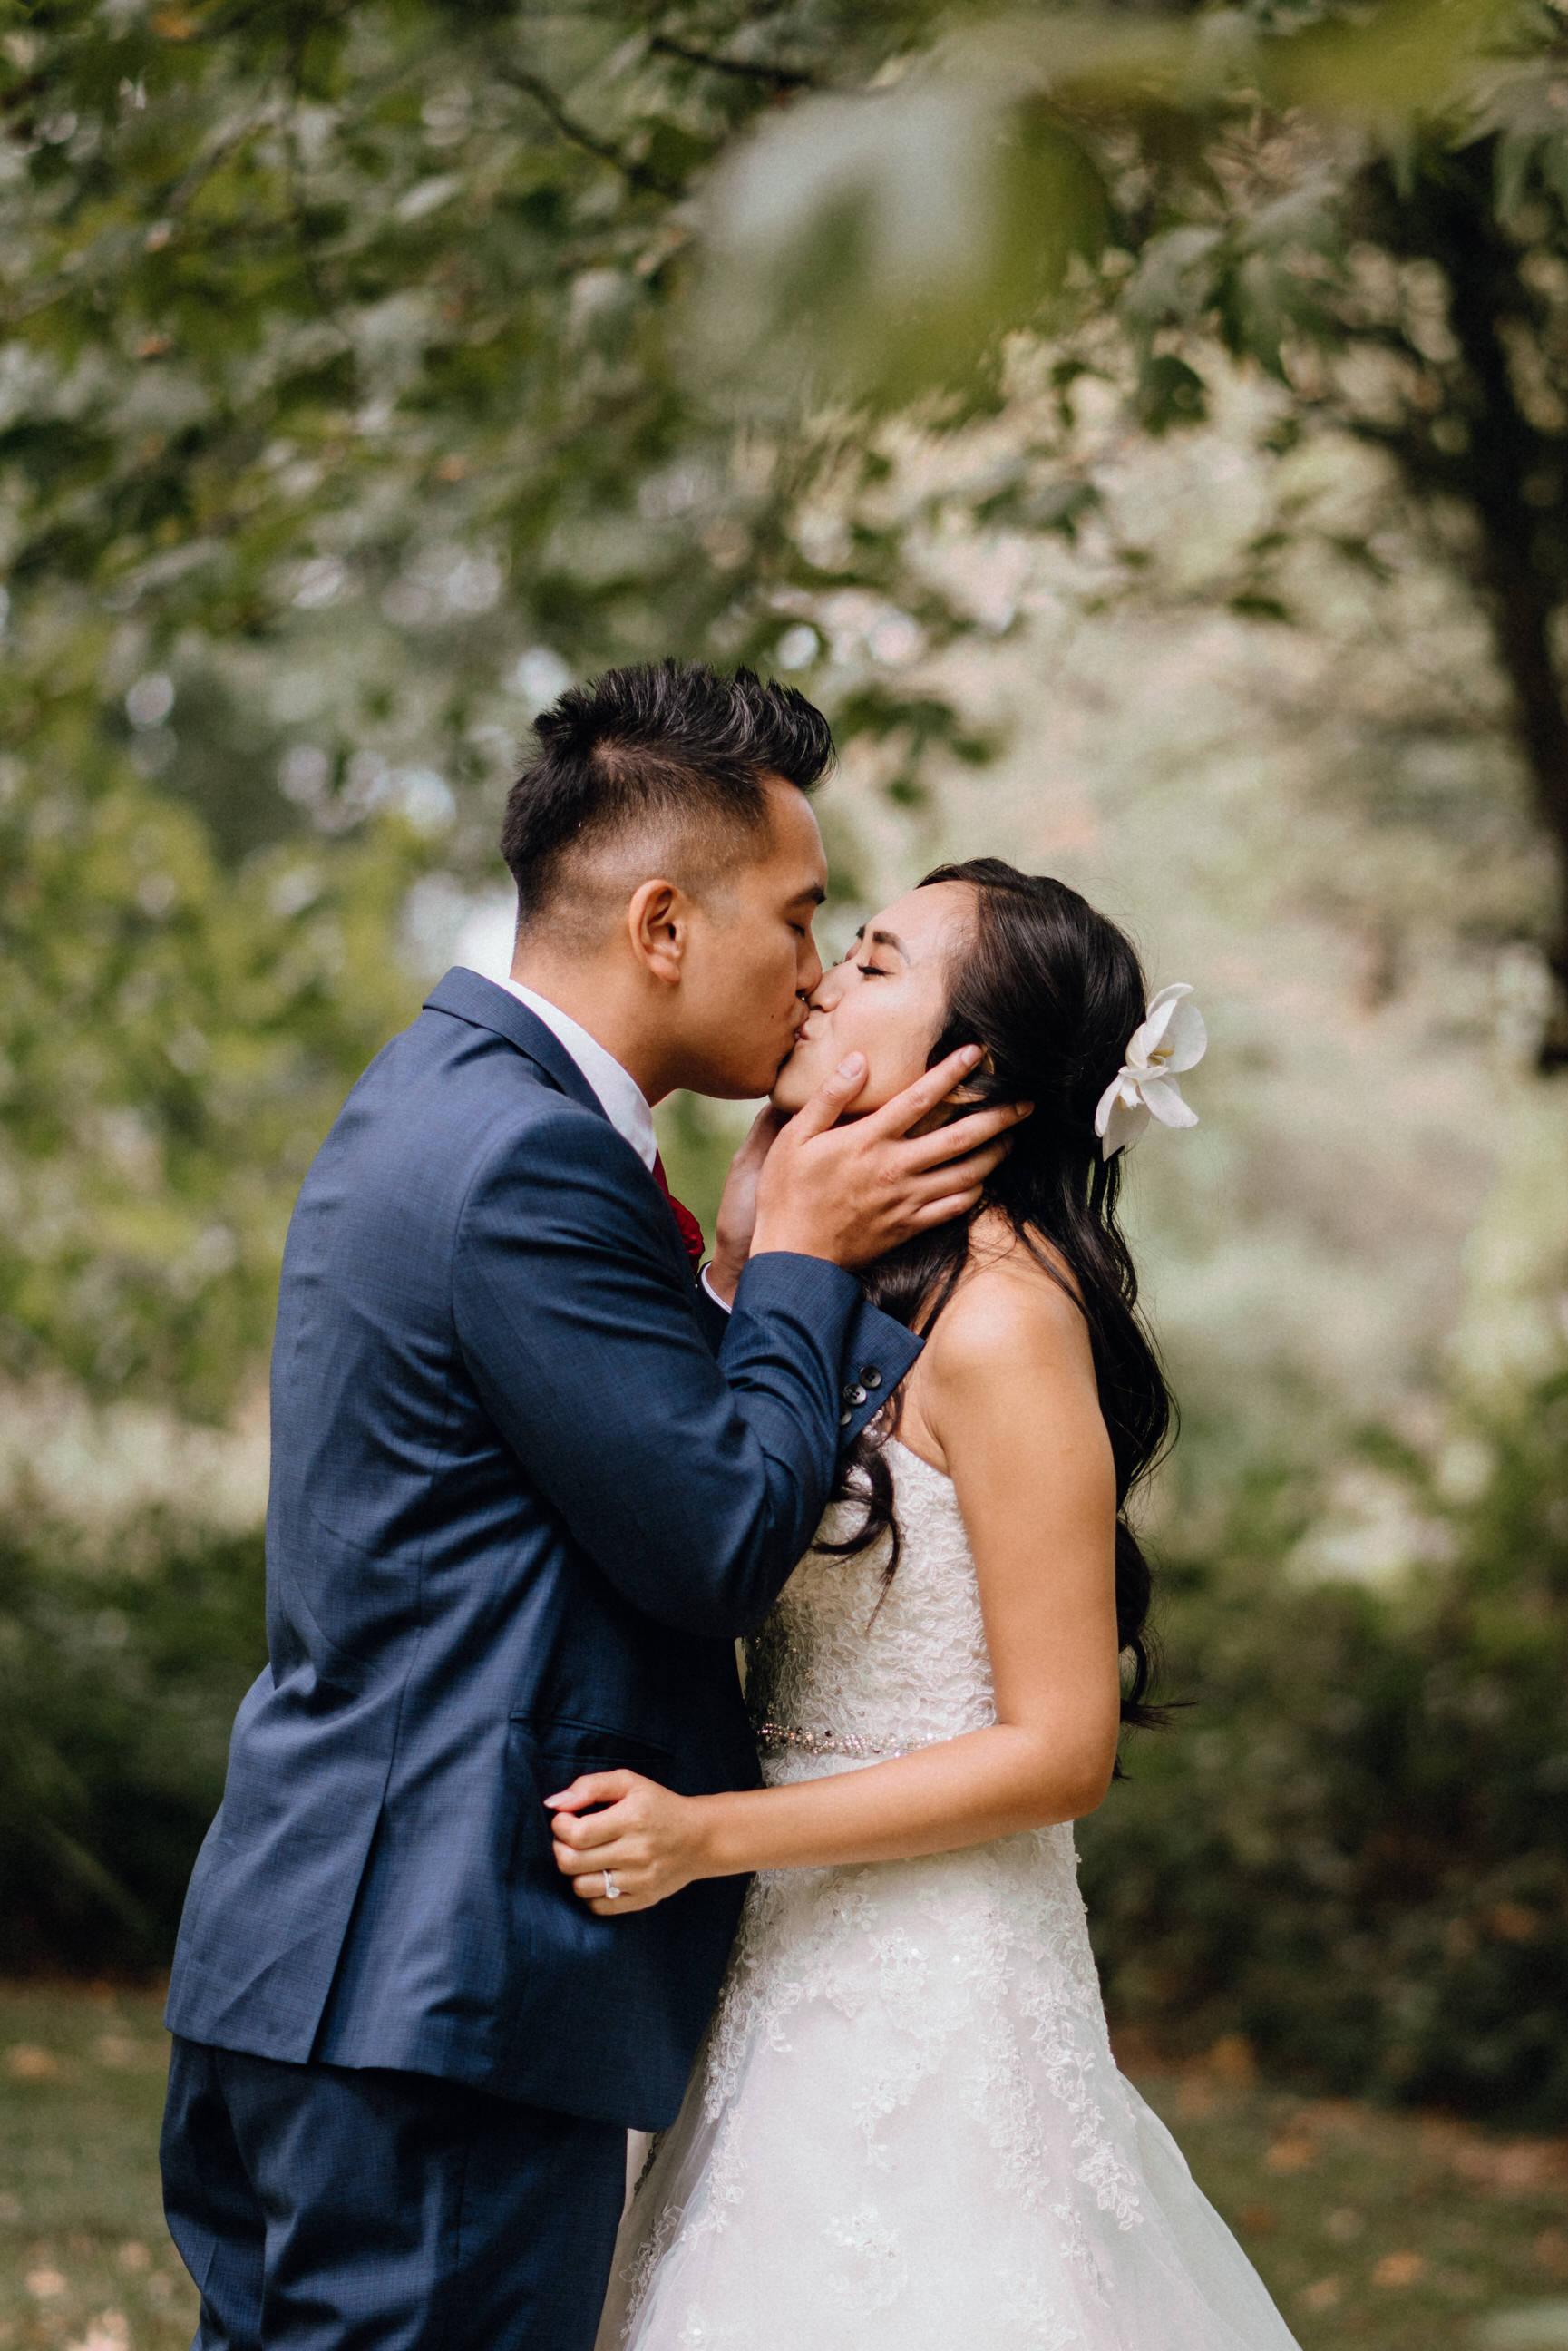 Asian wedding photography.jpg